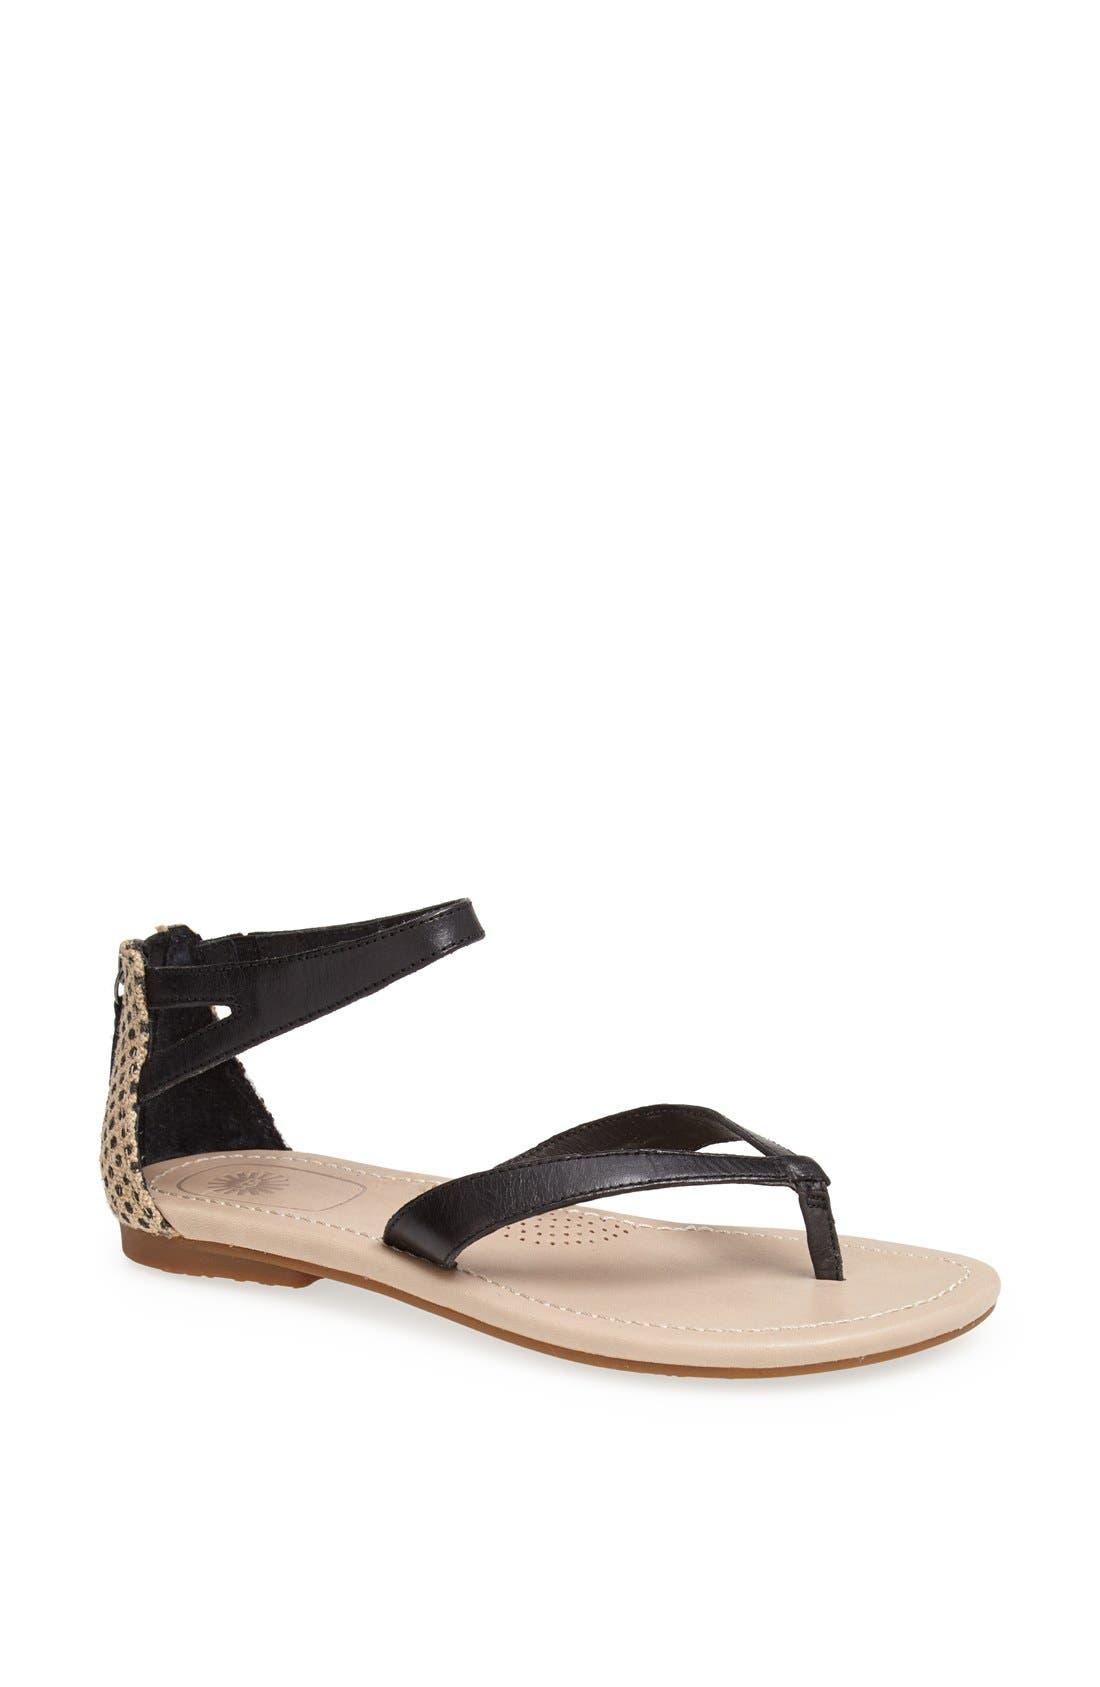 Alternate Image 1 Selected - UGG® Australia 'Tarra' Sandal